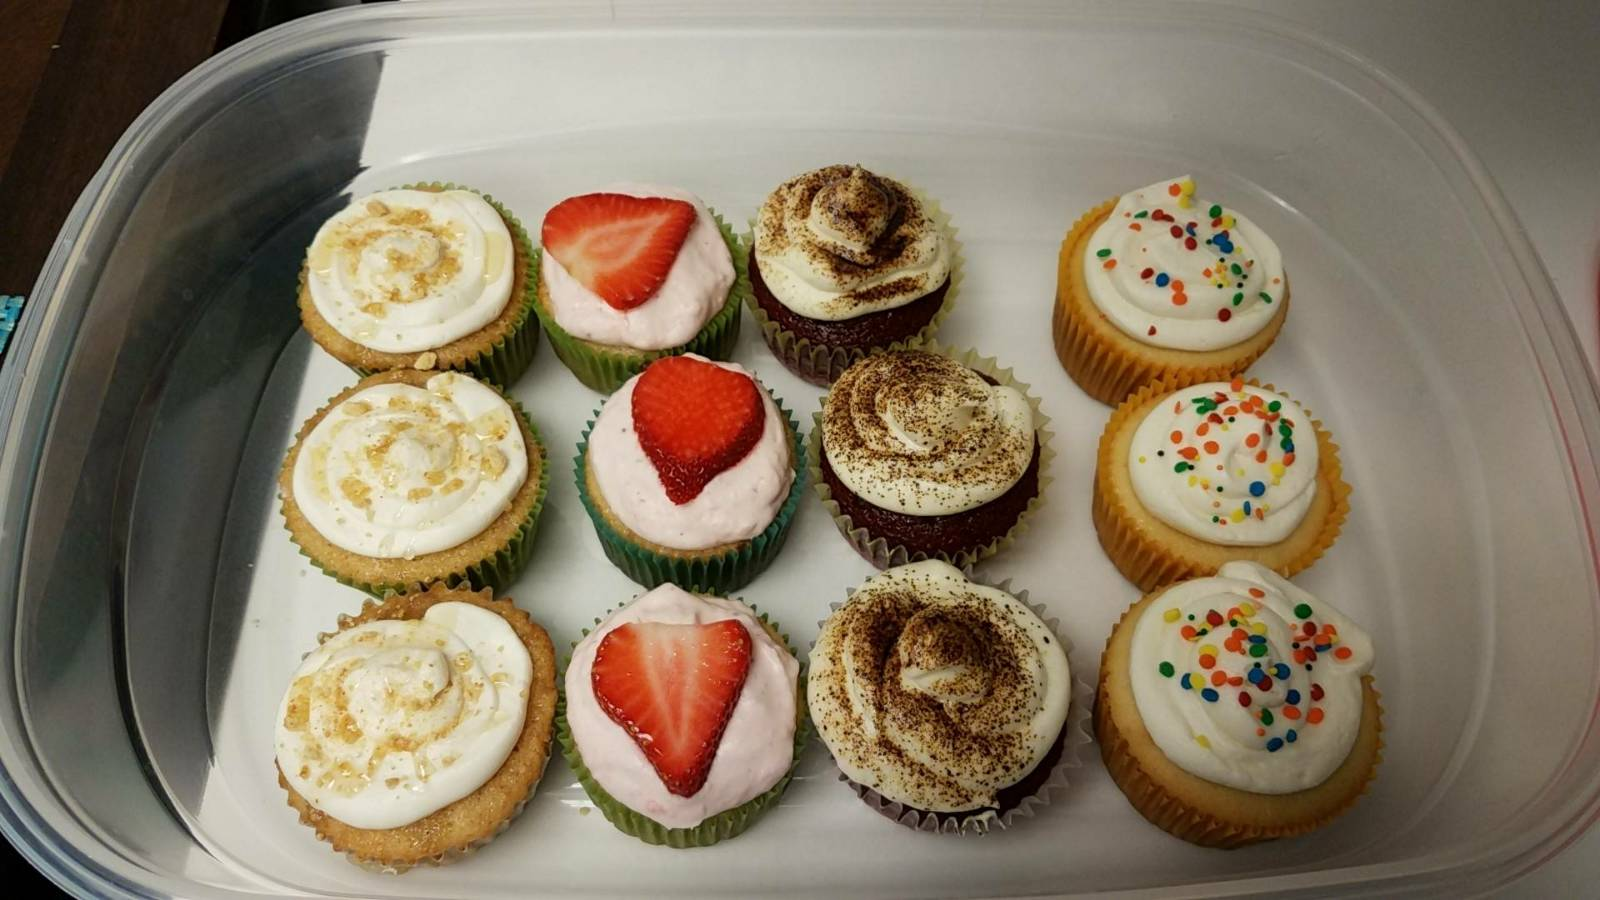 Variety Pack Cupcakes